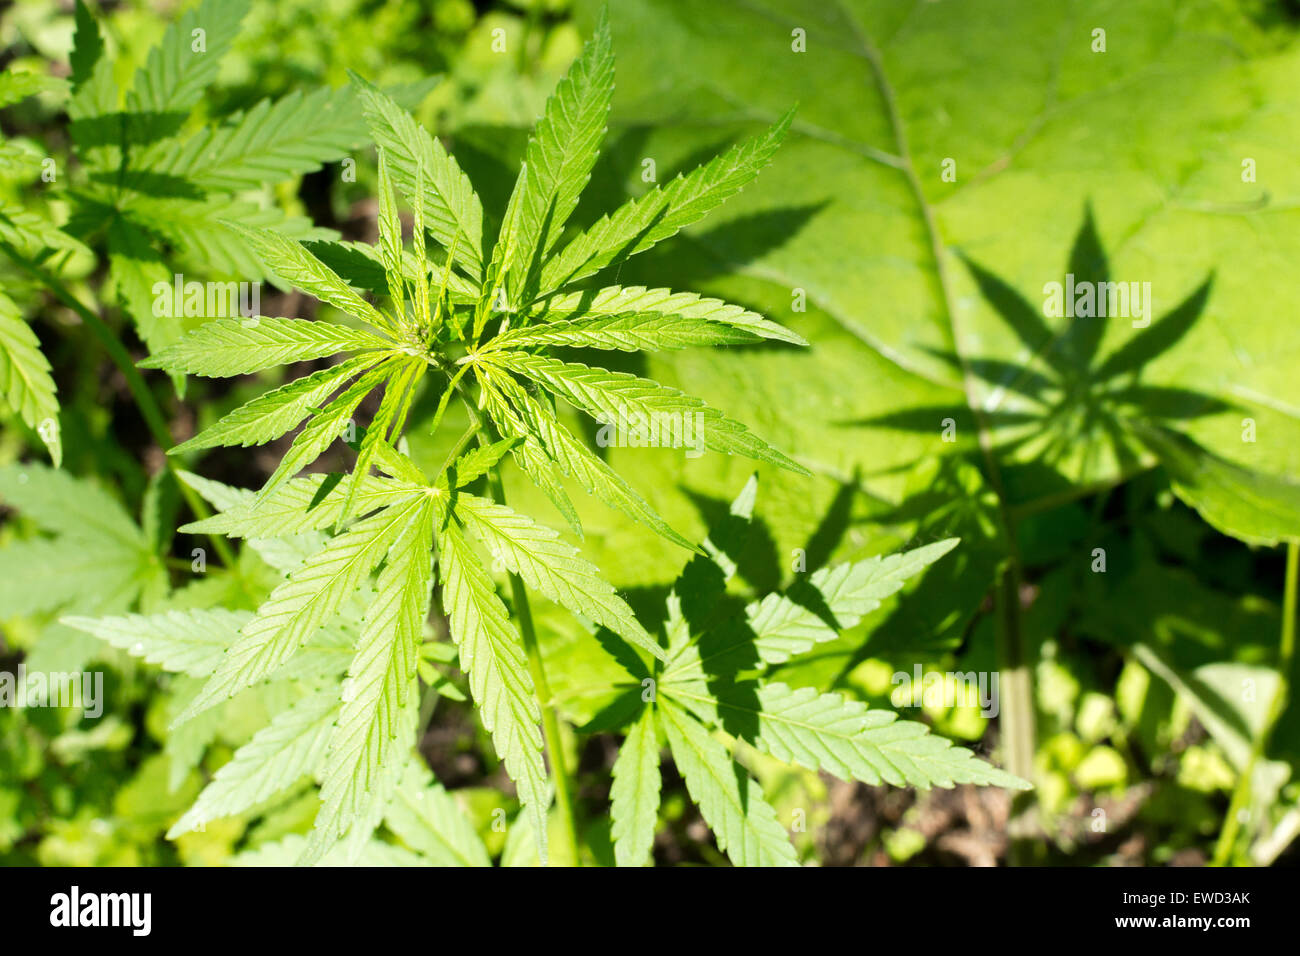 Drug culture stock photos drug culture stock images alamy agriculture background cannabis closeup culture dope drug farming ganja grass green grow hash hemp herb herbal izmirmasajfo